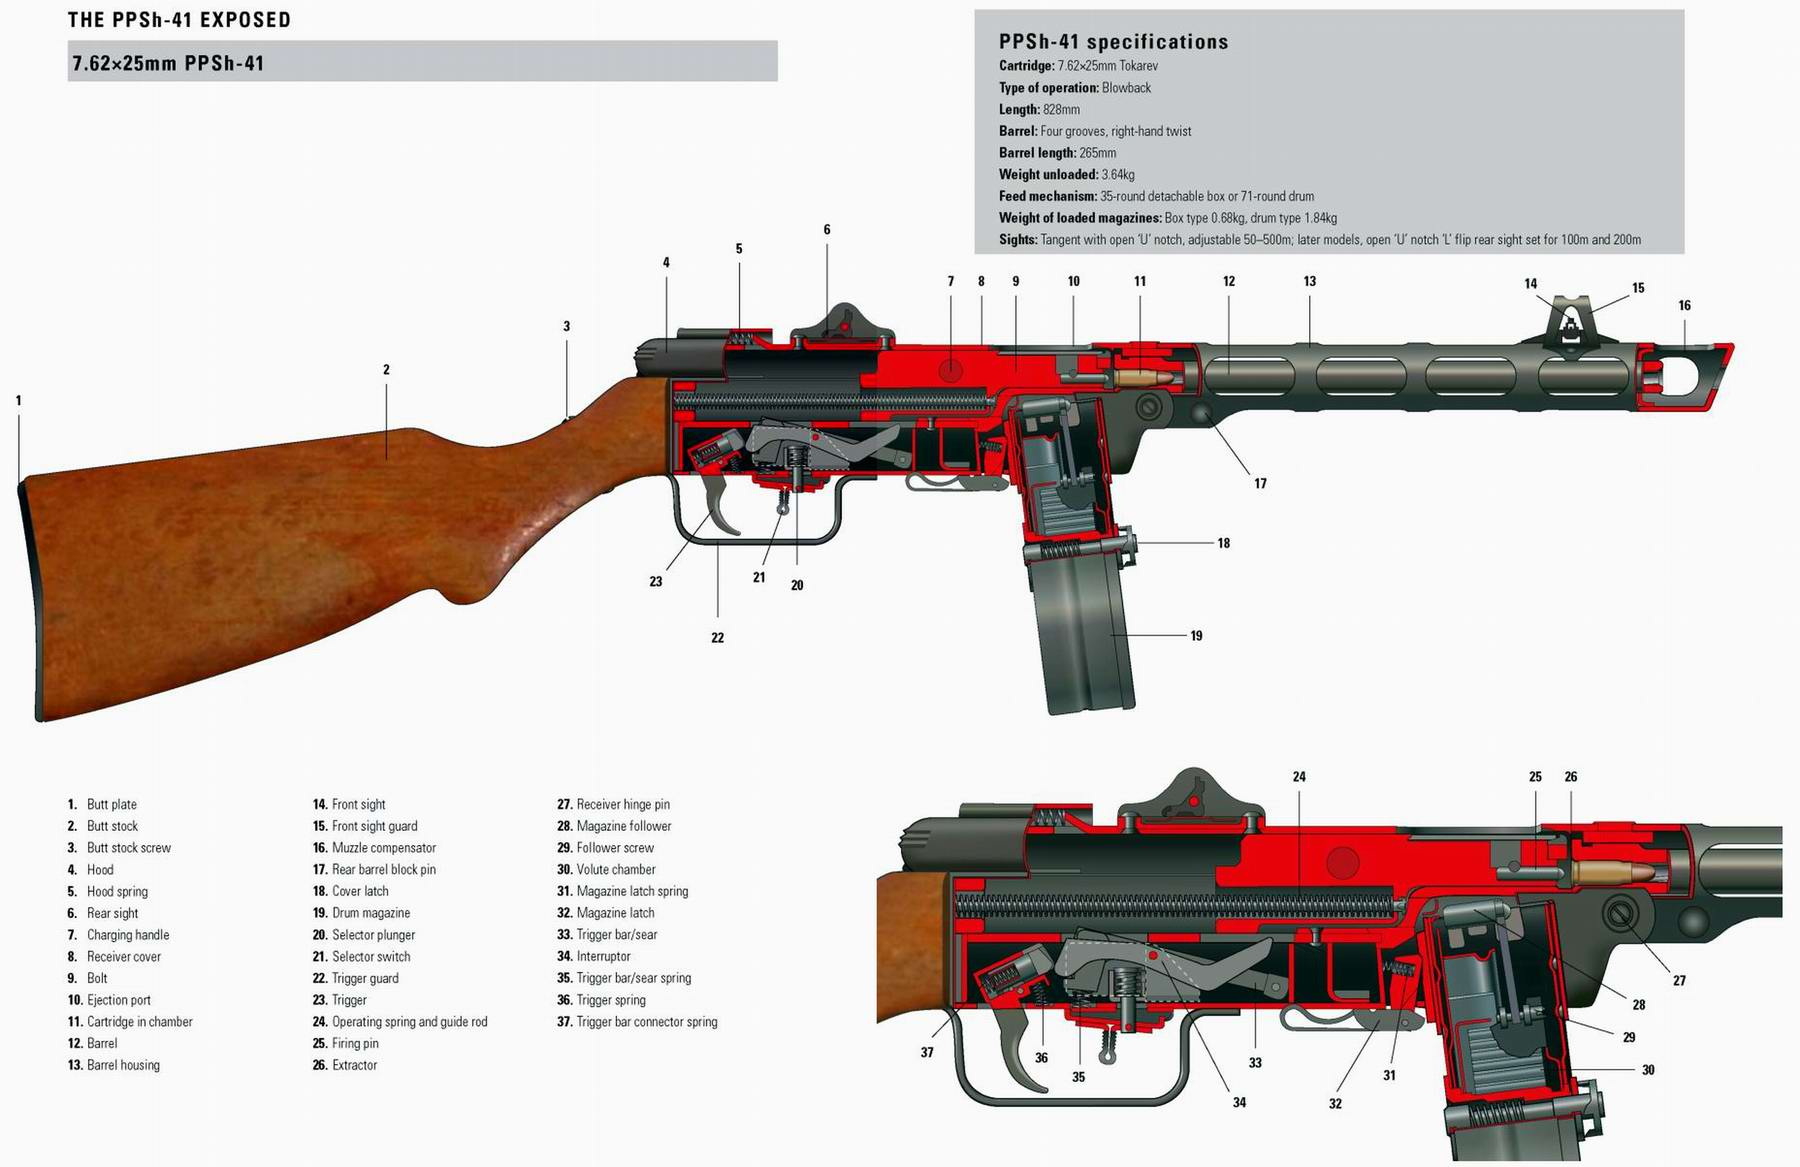 ППШ-41 - пистолет-пулемет Шпагина образца 1941 года (СССР)